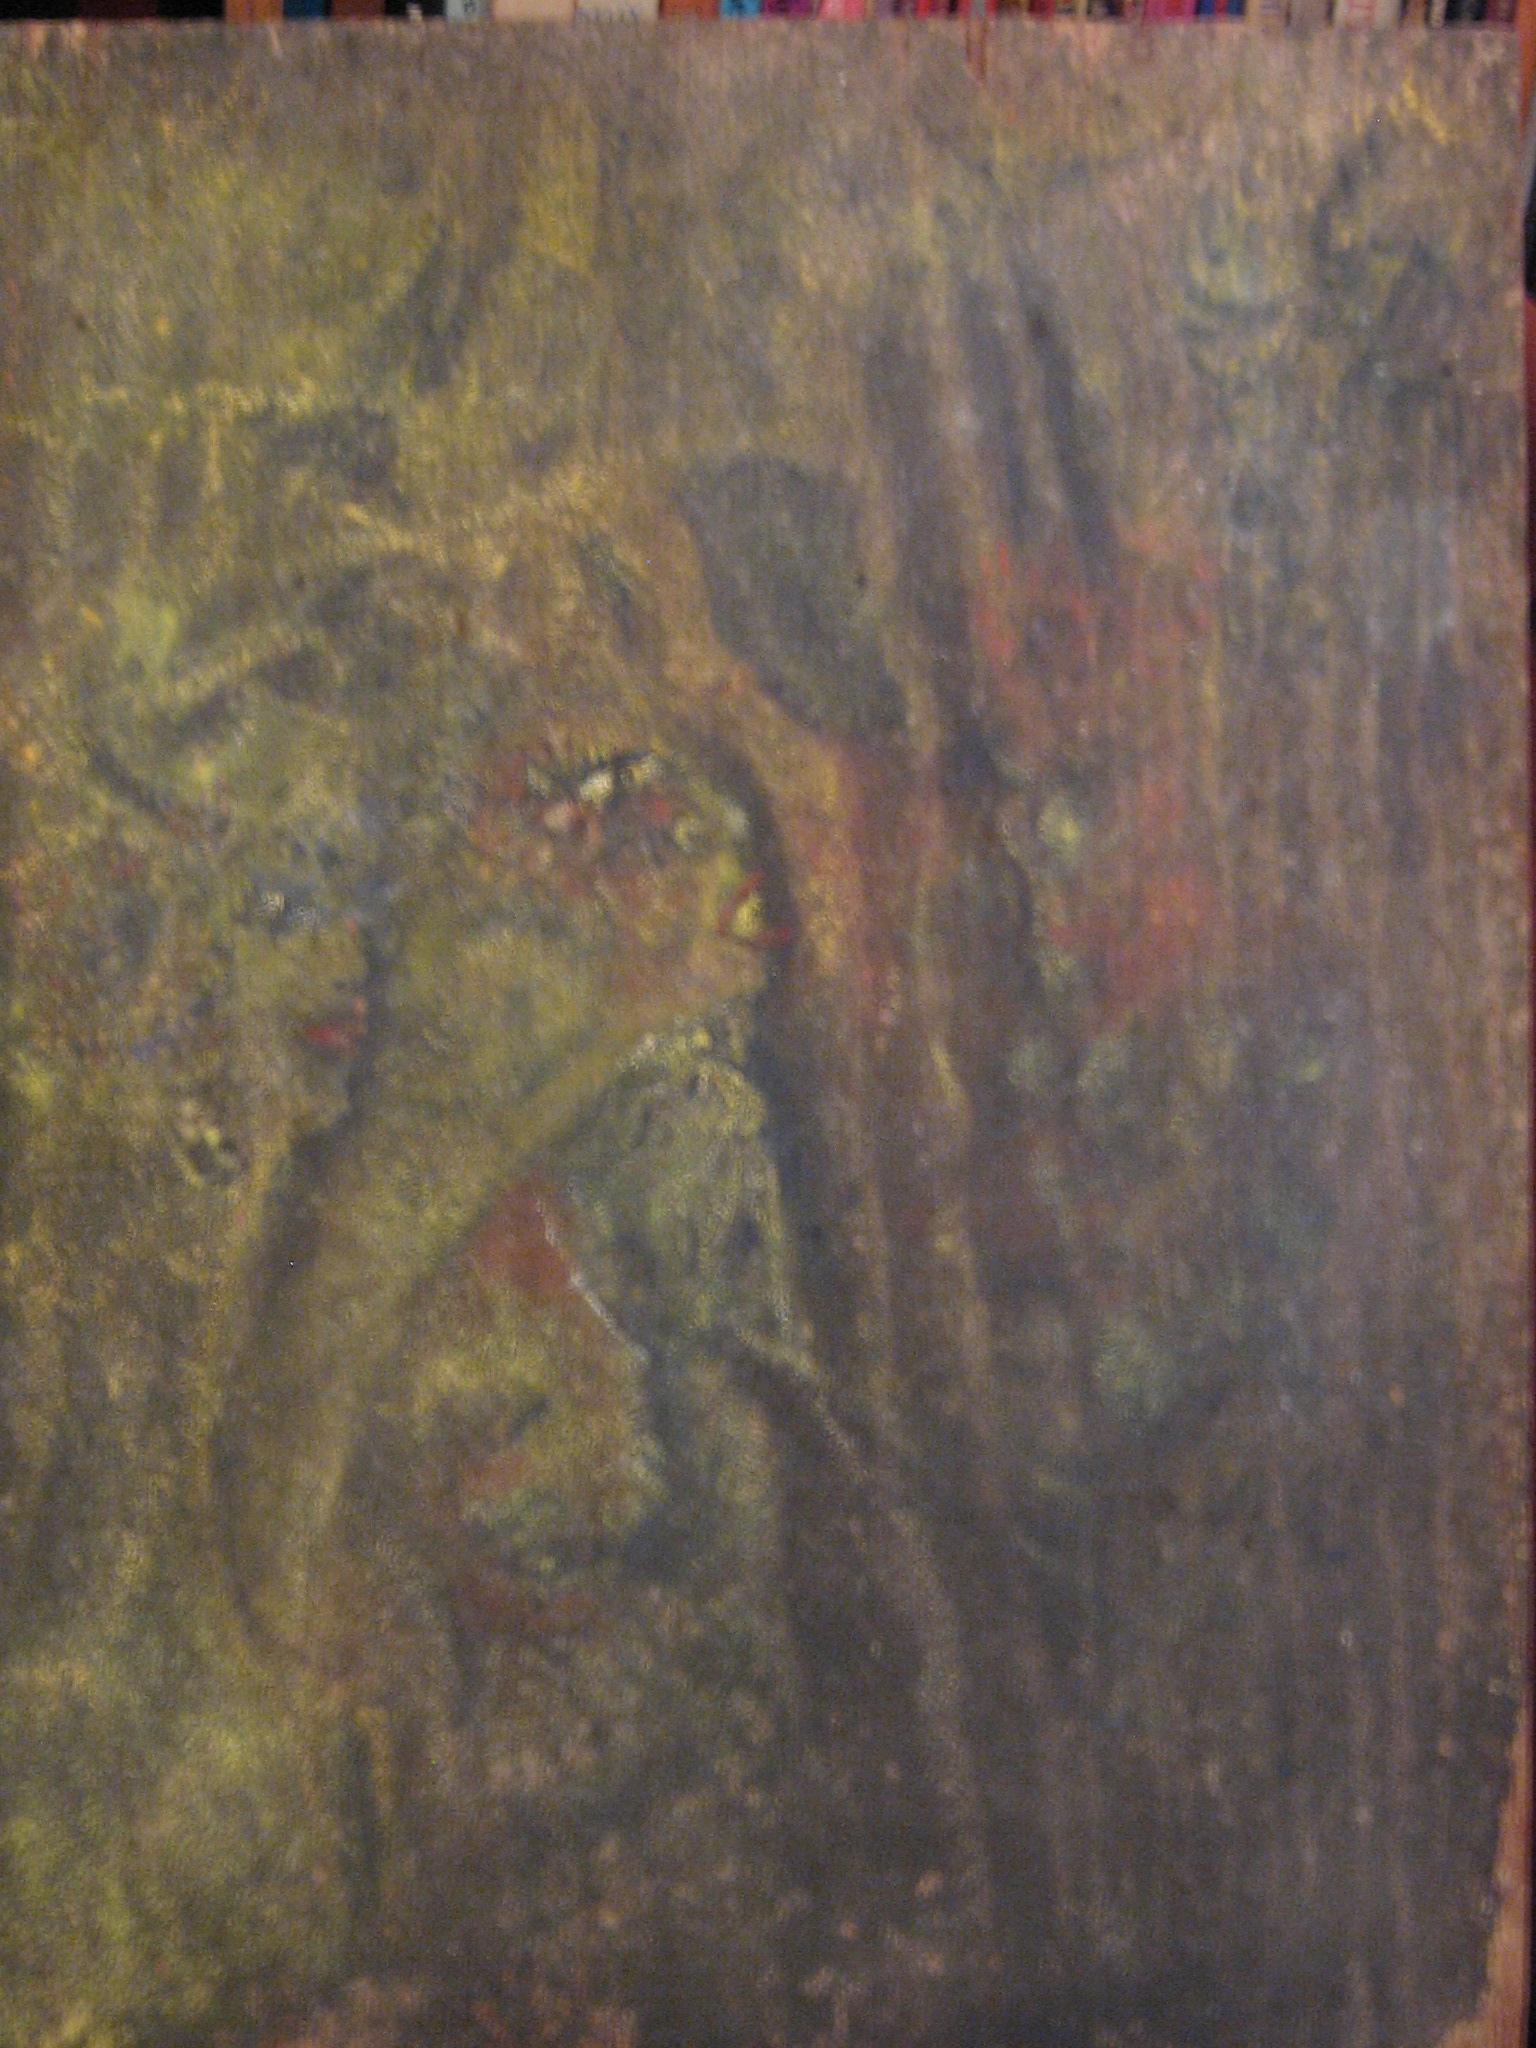 shaver-painting-1.JPG